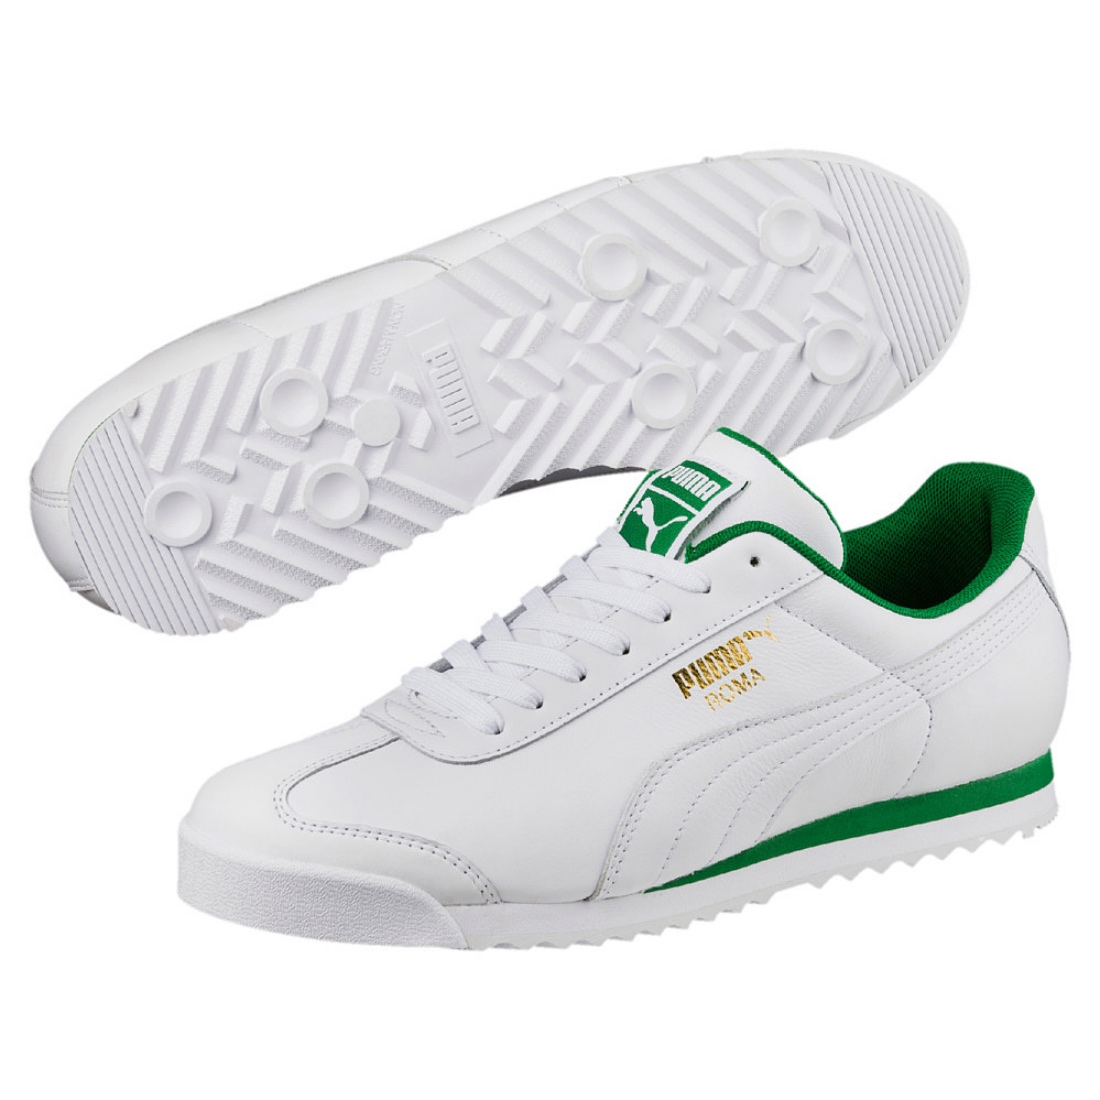 bastante baratas compra genuina mujer Puma Roma Classic Trainers Shoes 365598 Puma White Amazon Green | eBay